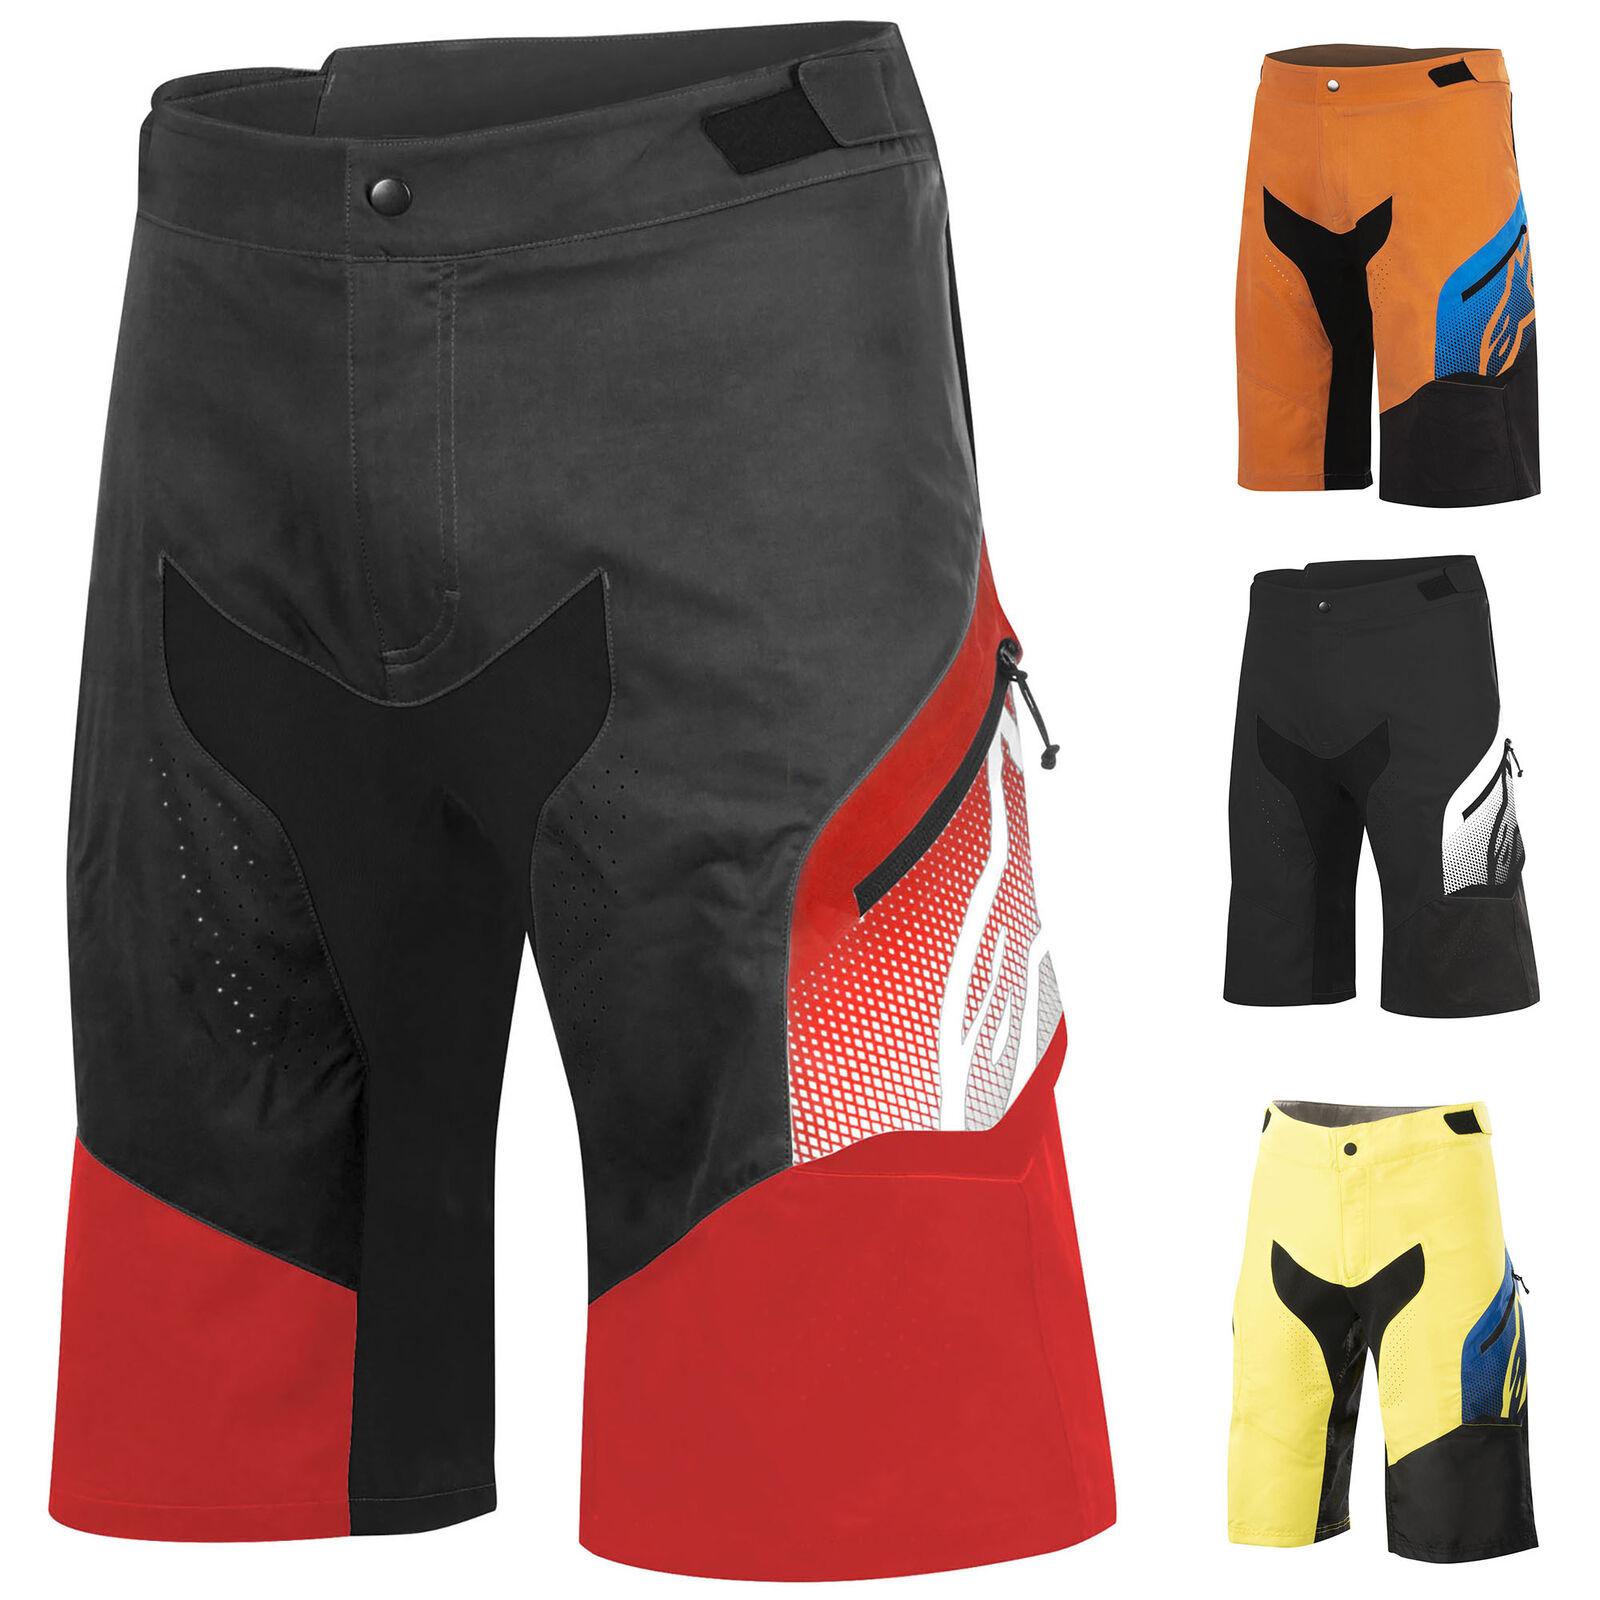 1726016 Para Hombre Deprojoador Pantalones Cortos Bombachos Alpinestars MTB Bicicleta Montañera para Descenso de rodilla